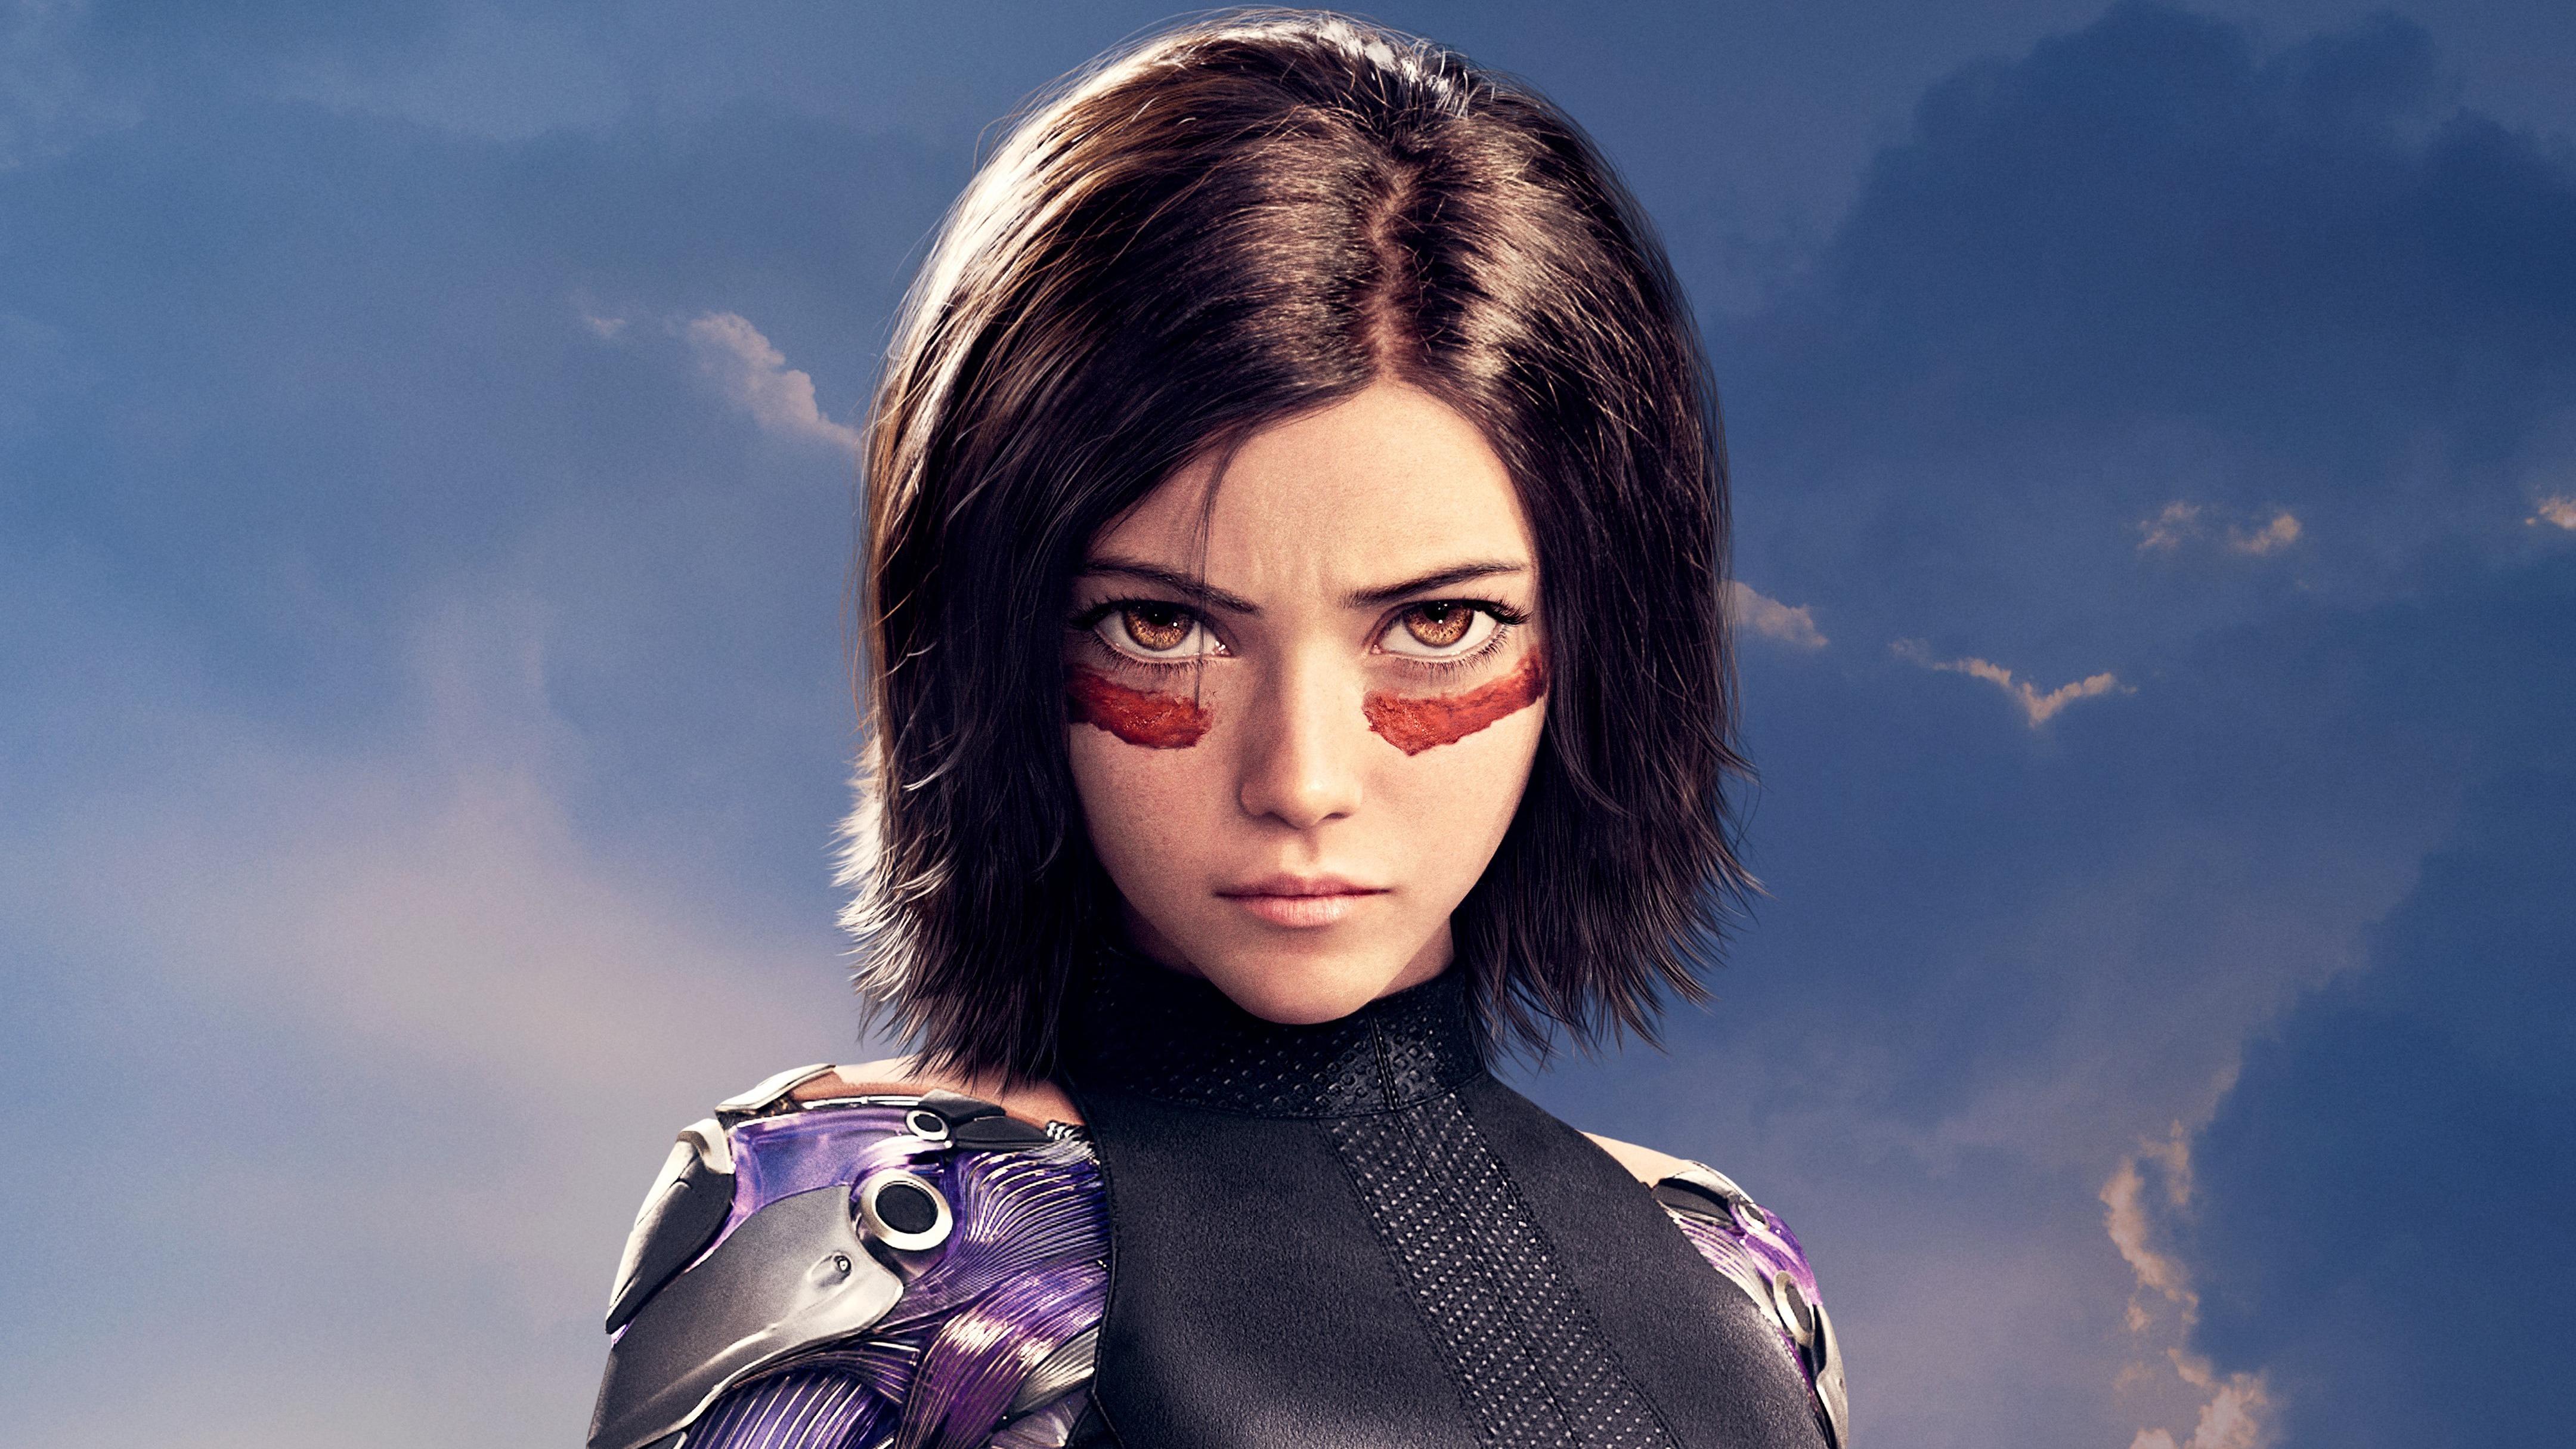 Rosa Salazar As Alita In Alita Battle Angel, HD Movies, 4k ...